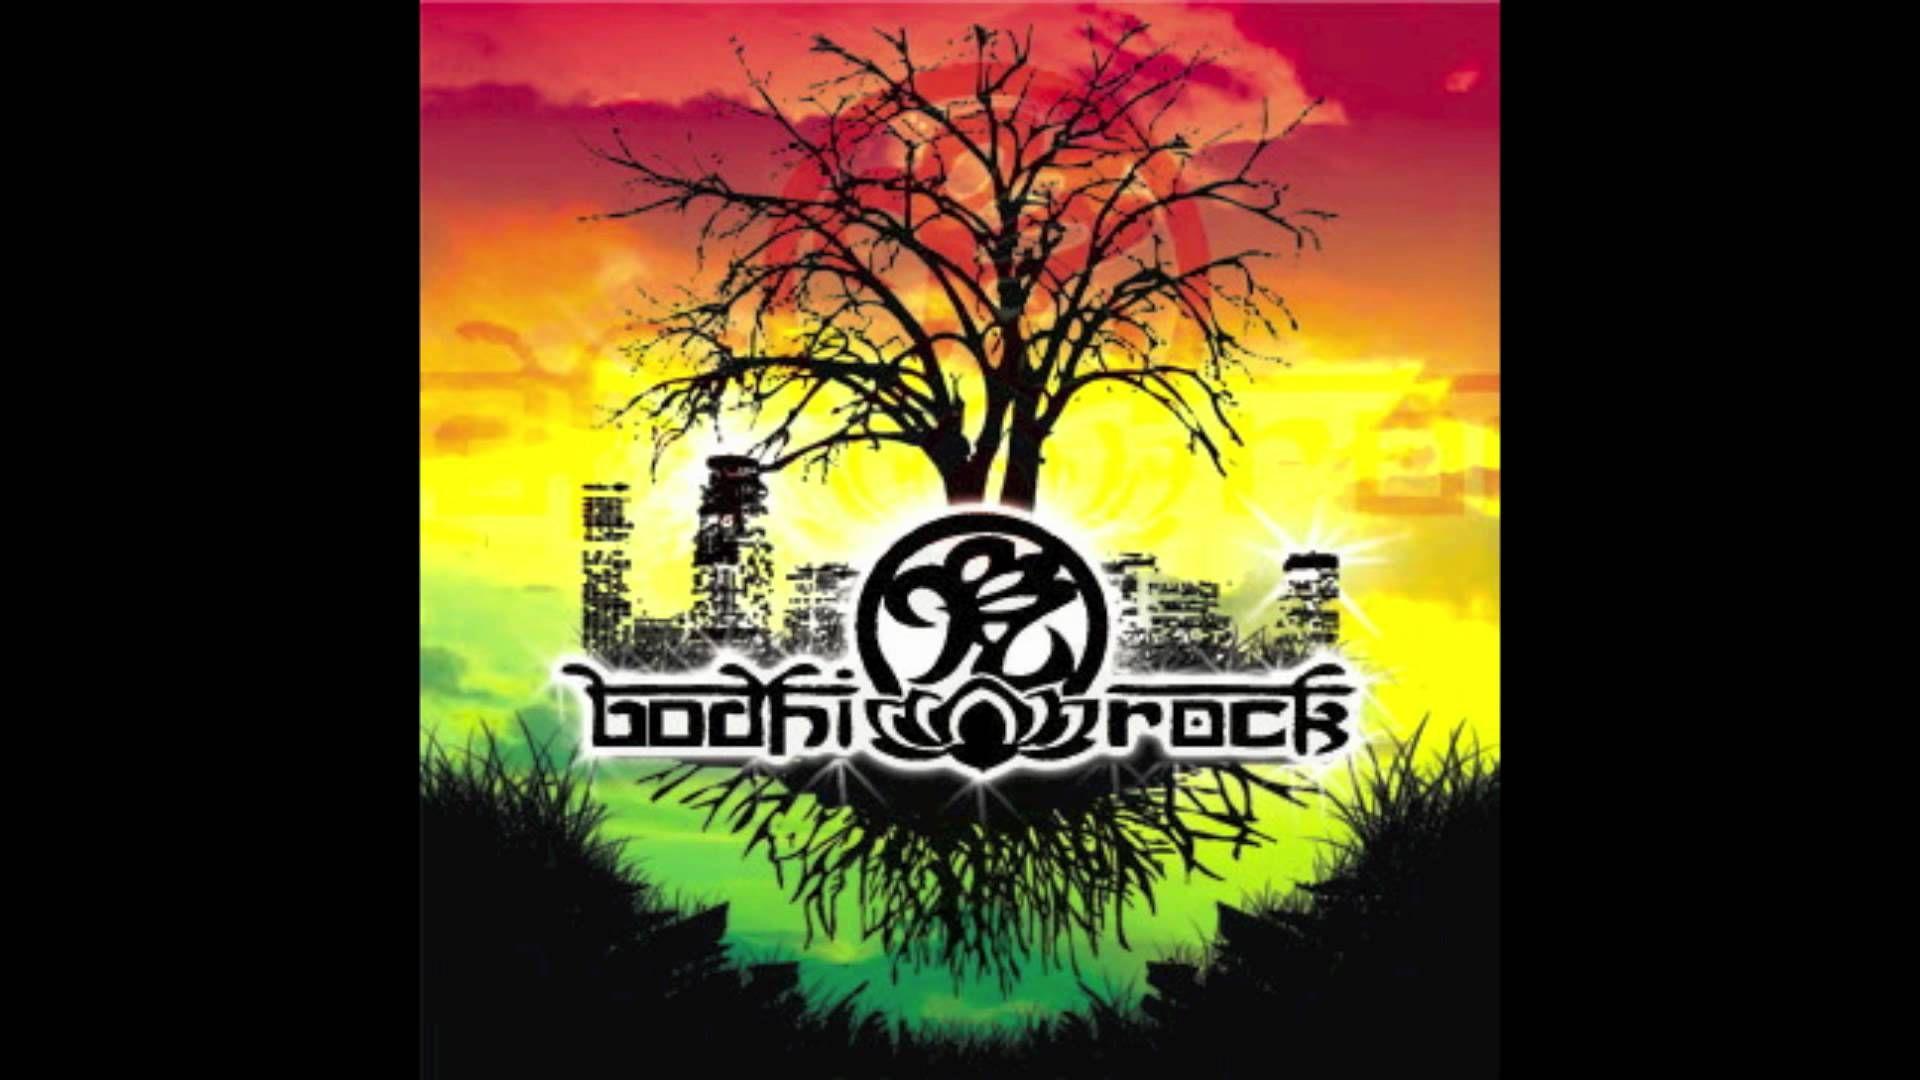 Bodhi Rock - Cali Life